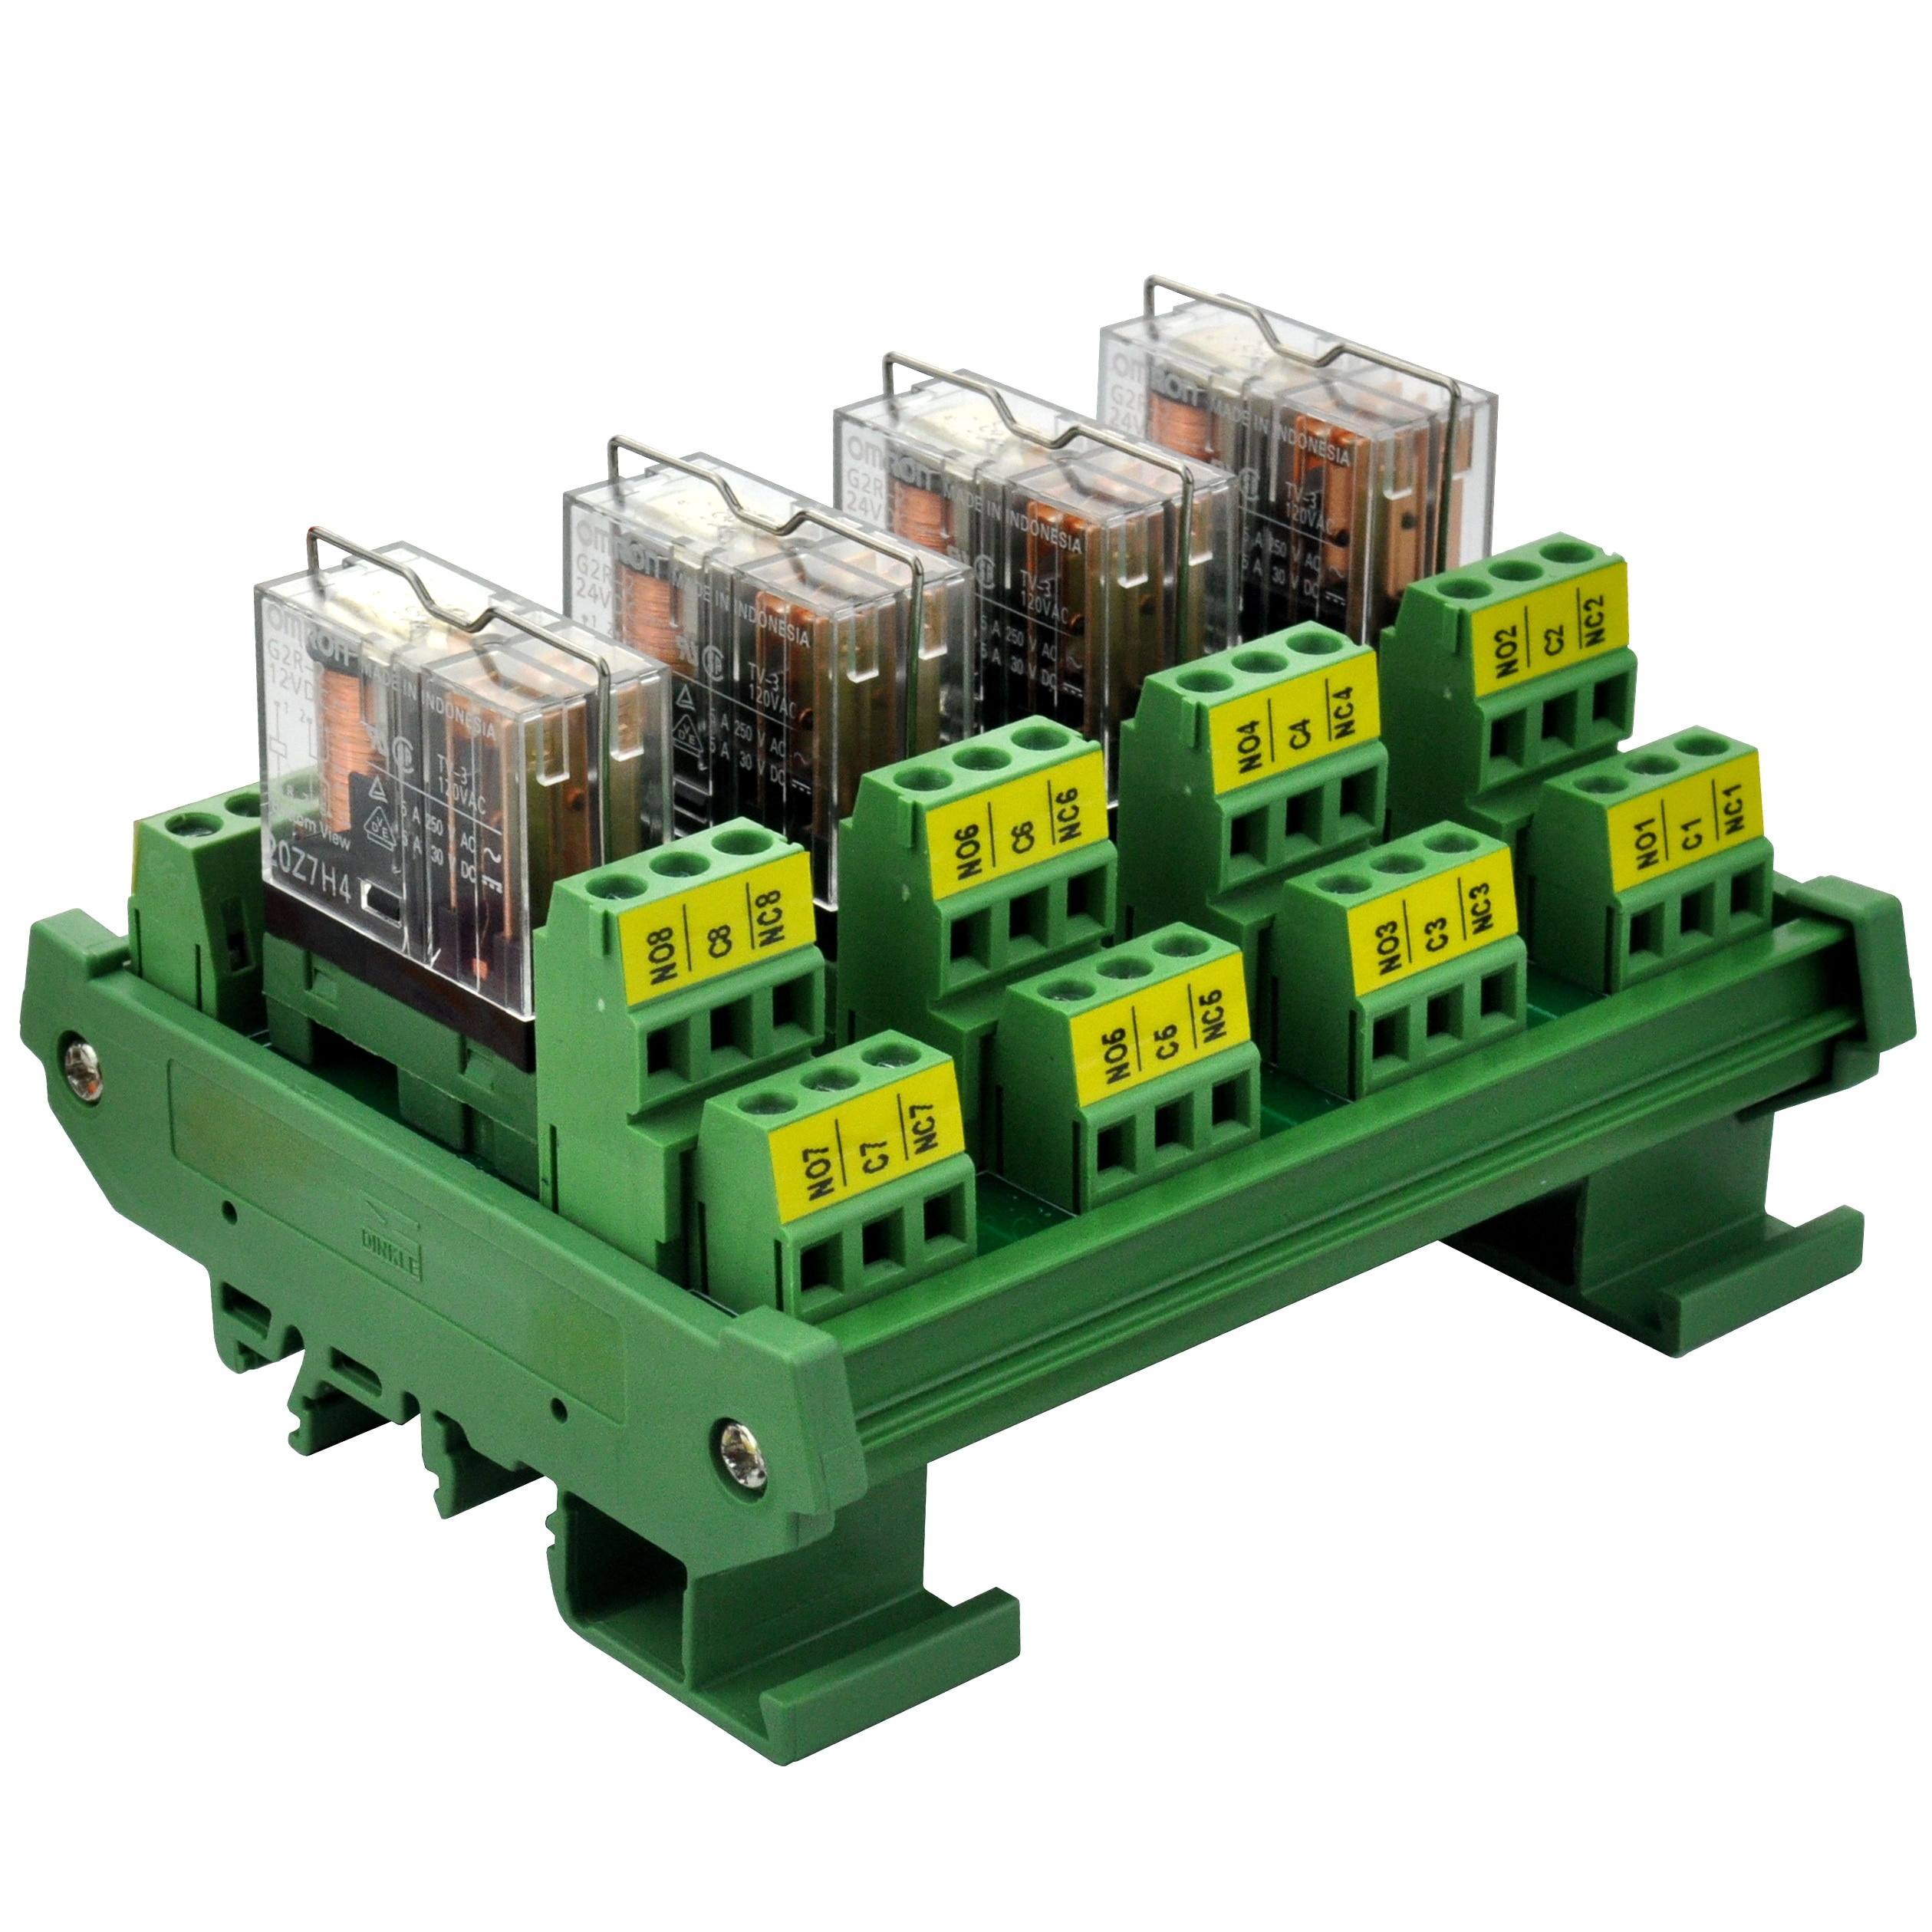 Electrónica-Salón DIN Rail montaje AC/DC 12V Control 4 DPDT 5Amp módulo de interfaz de relé de potencia enchufable ¡!